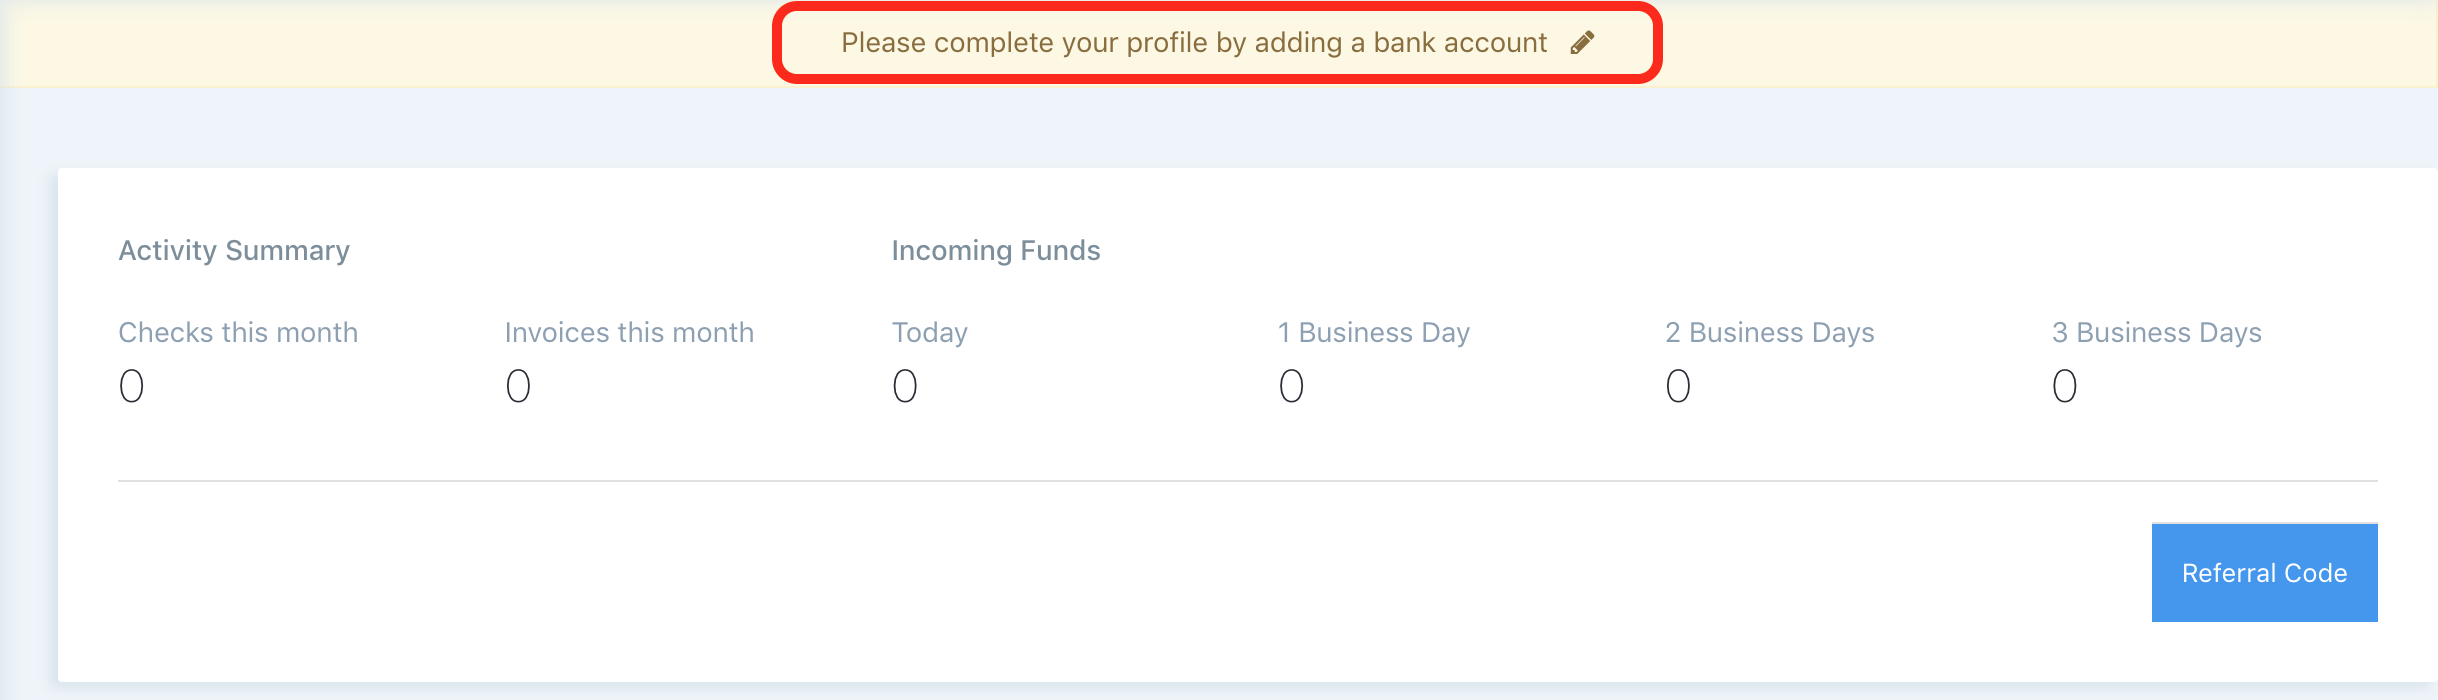 Instant Account Verification